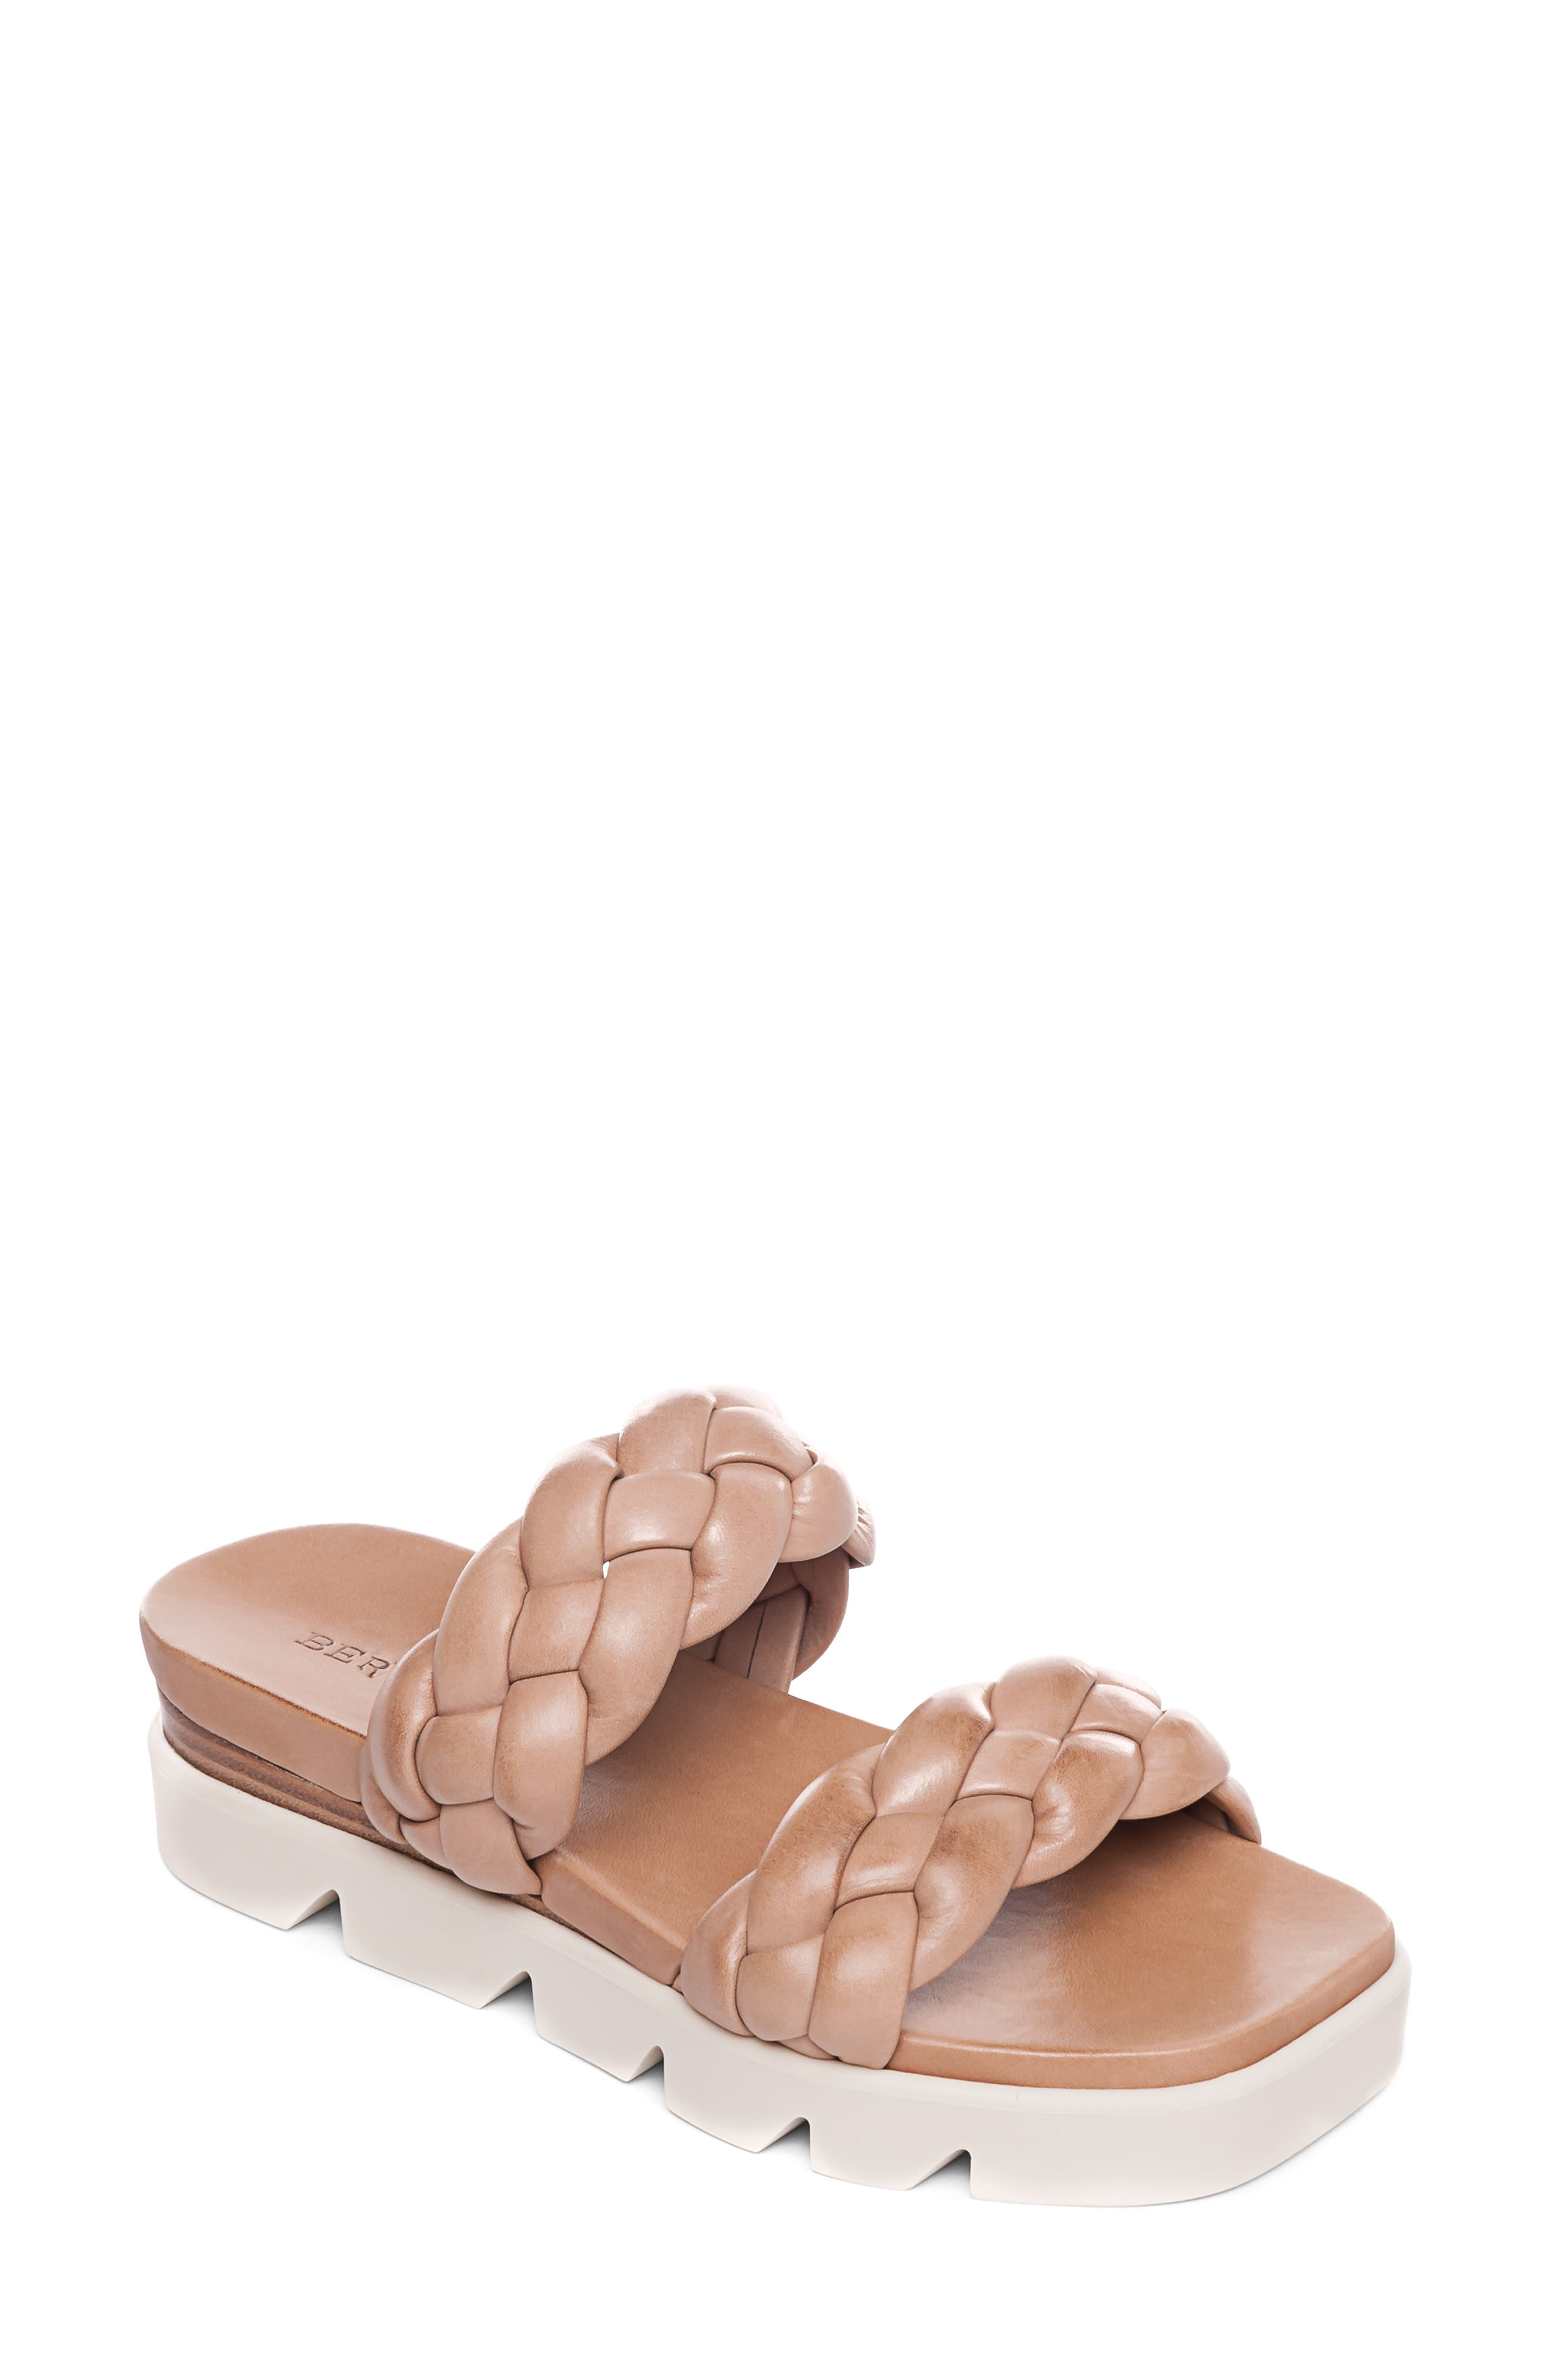 Ciara Braided Slide Sandal